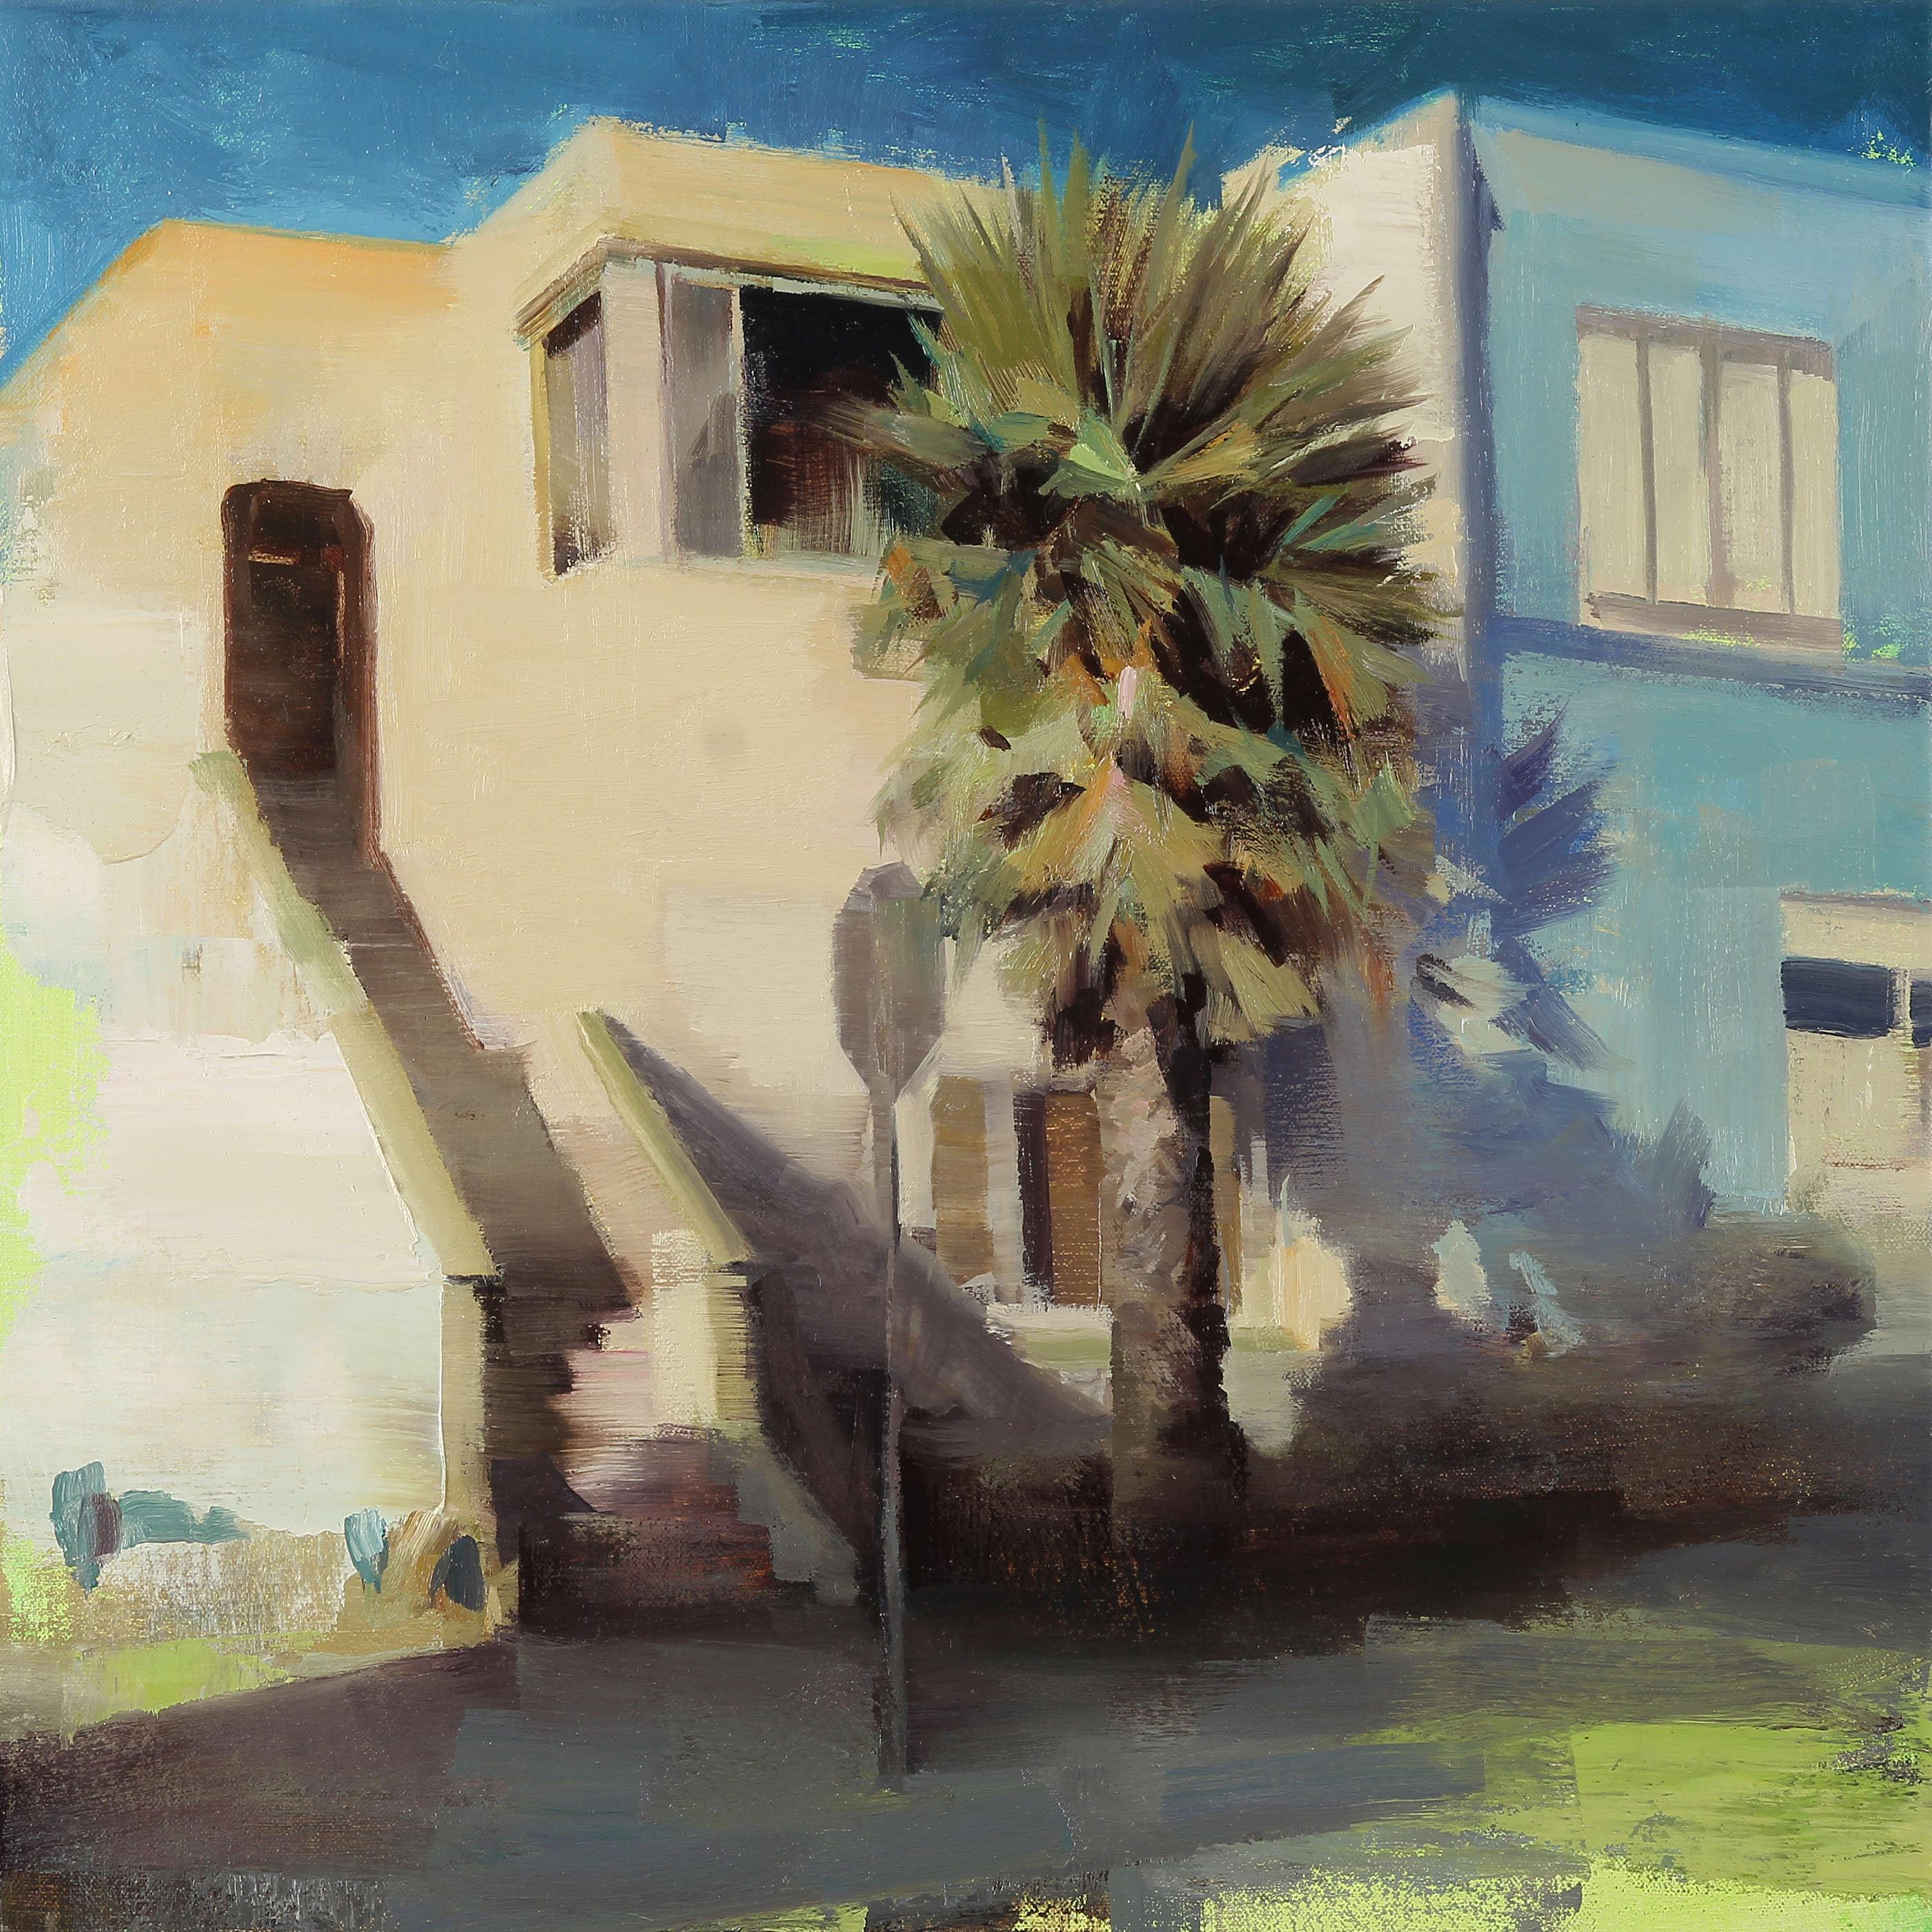 Kim Cogan  Ingleside, 2017  oil on canvas  18 x 18 in. 45.72 x 45.72 cm